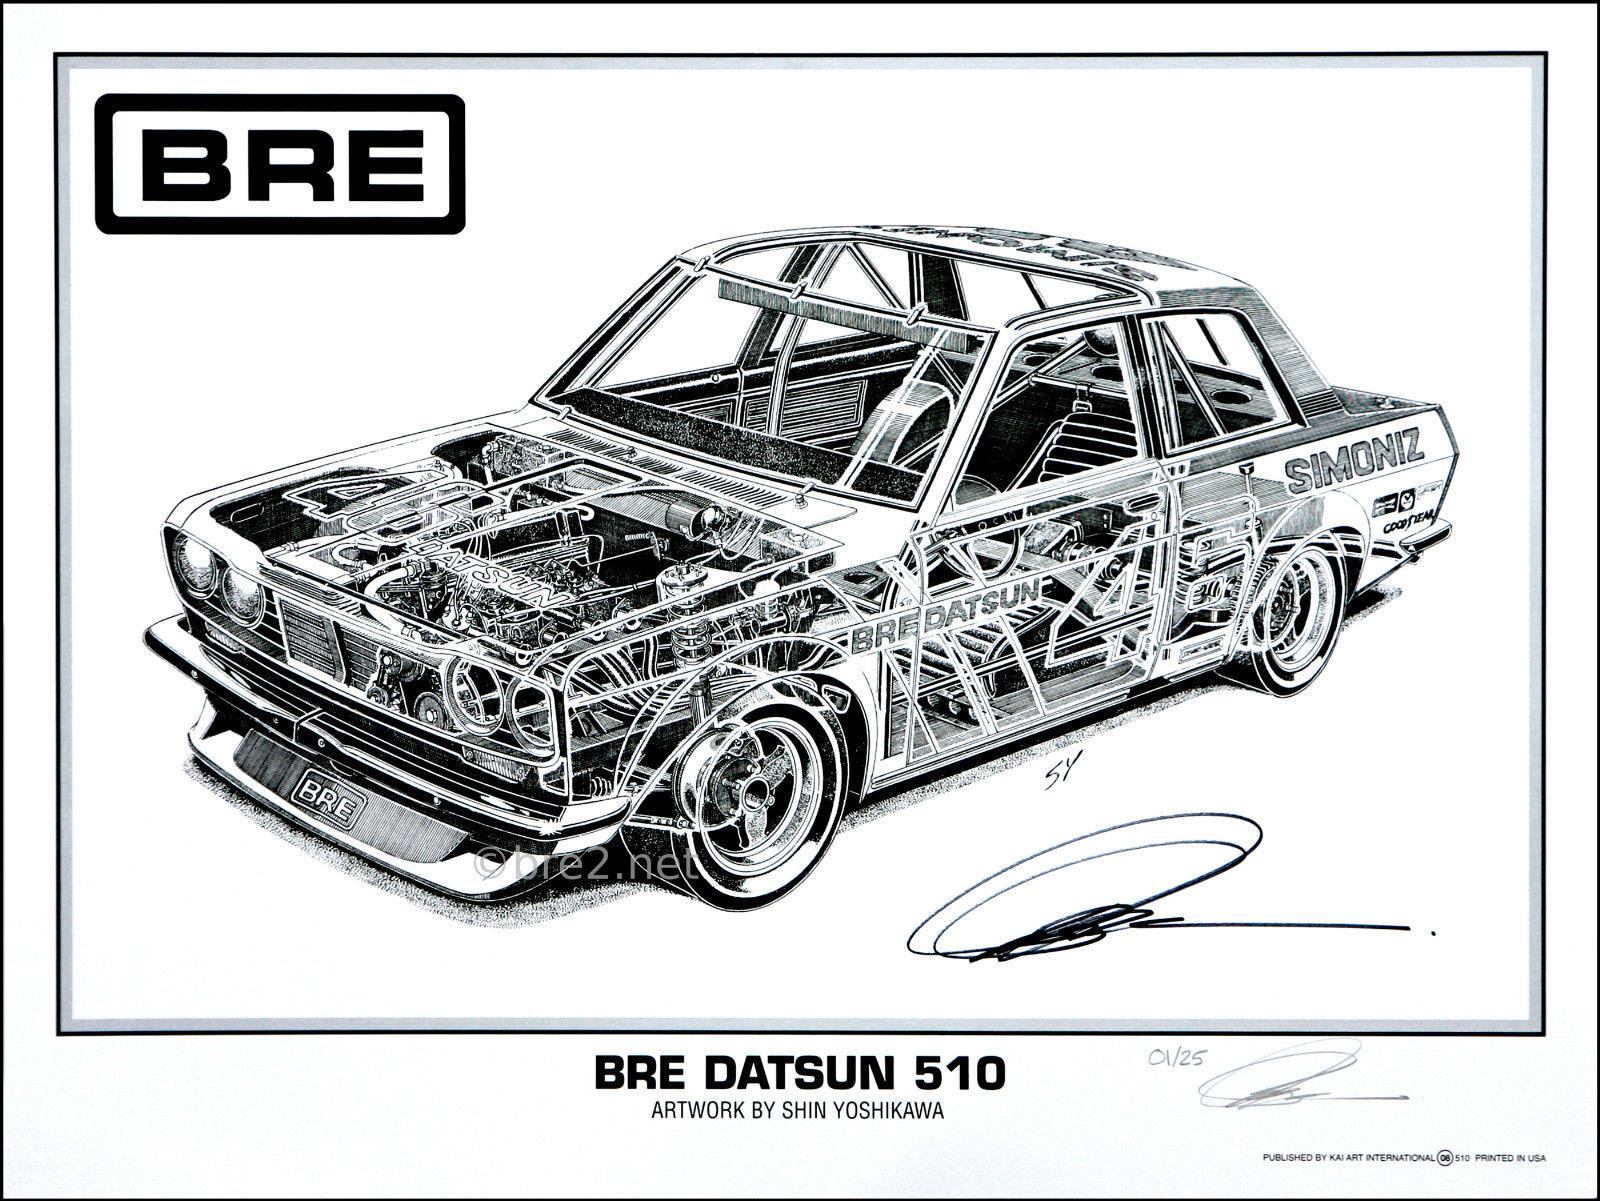 Datsun Advertising